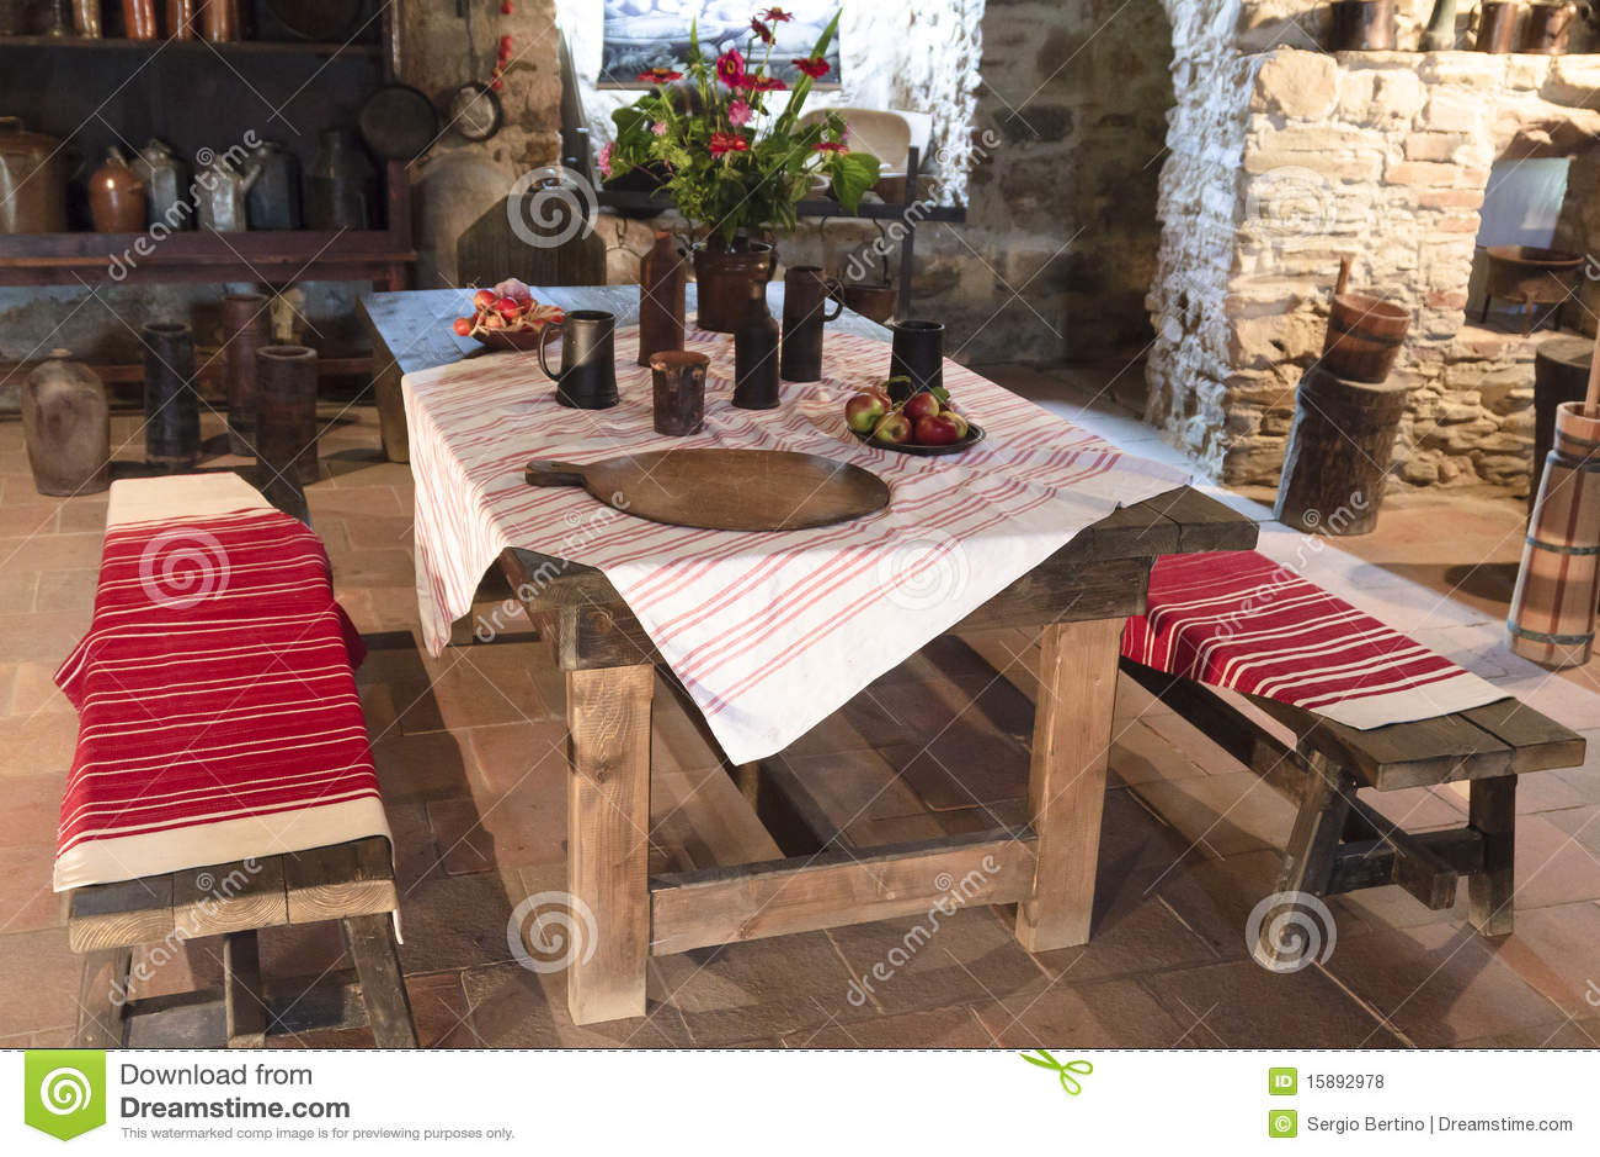 kitchen banquettes for sale faucet pull out sprayer 中世纪城堡的厨房库存照片 图片包括有厨房 长凳 城堡 内部 室内 长凳城堡厨房中世纪老斯洛伐克表